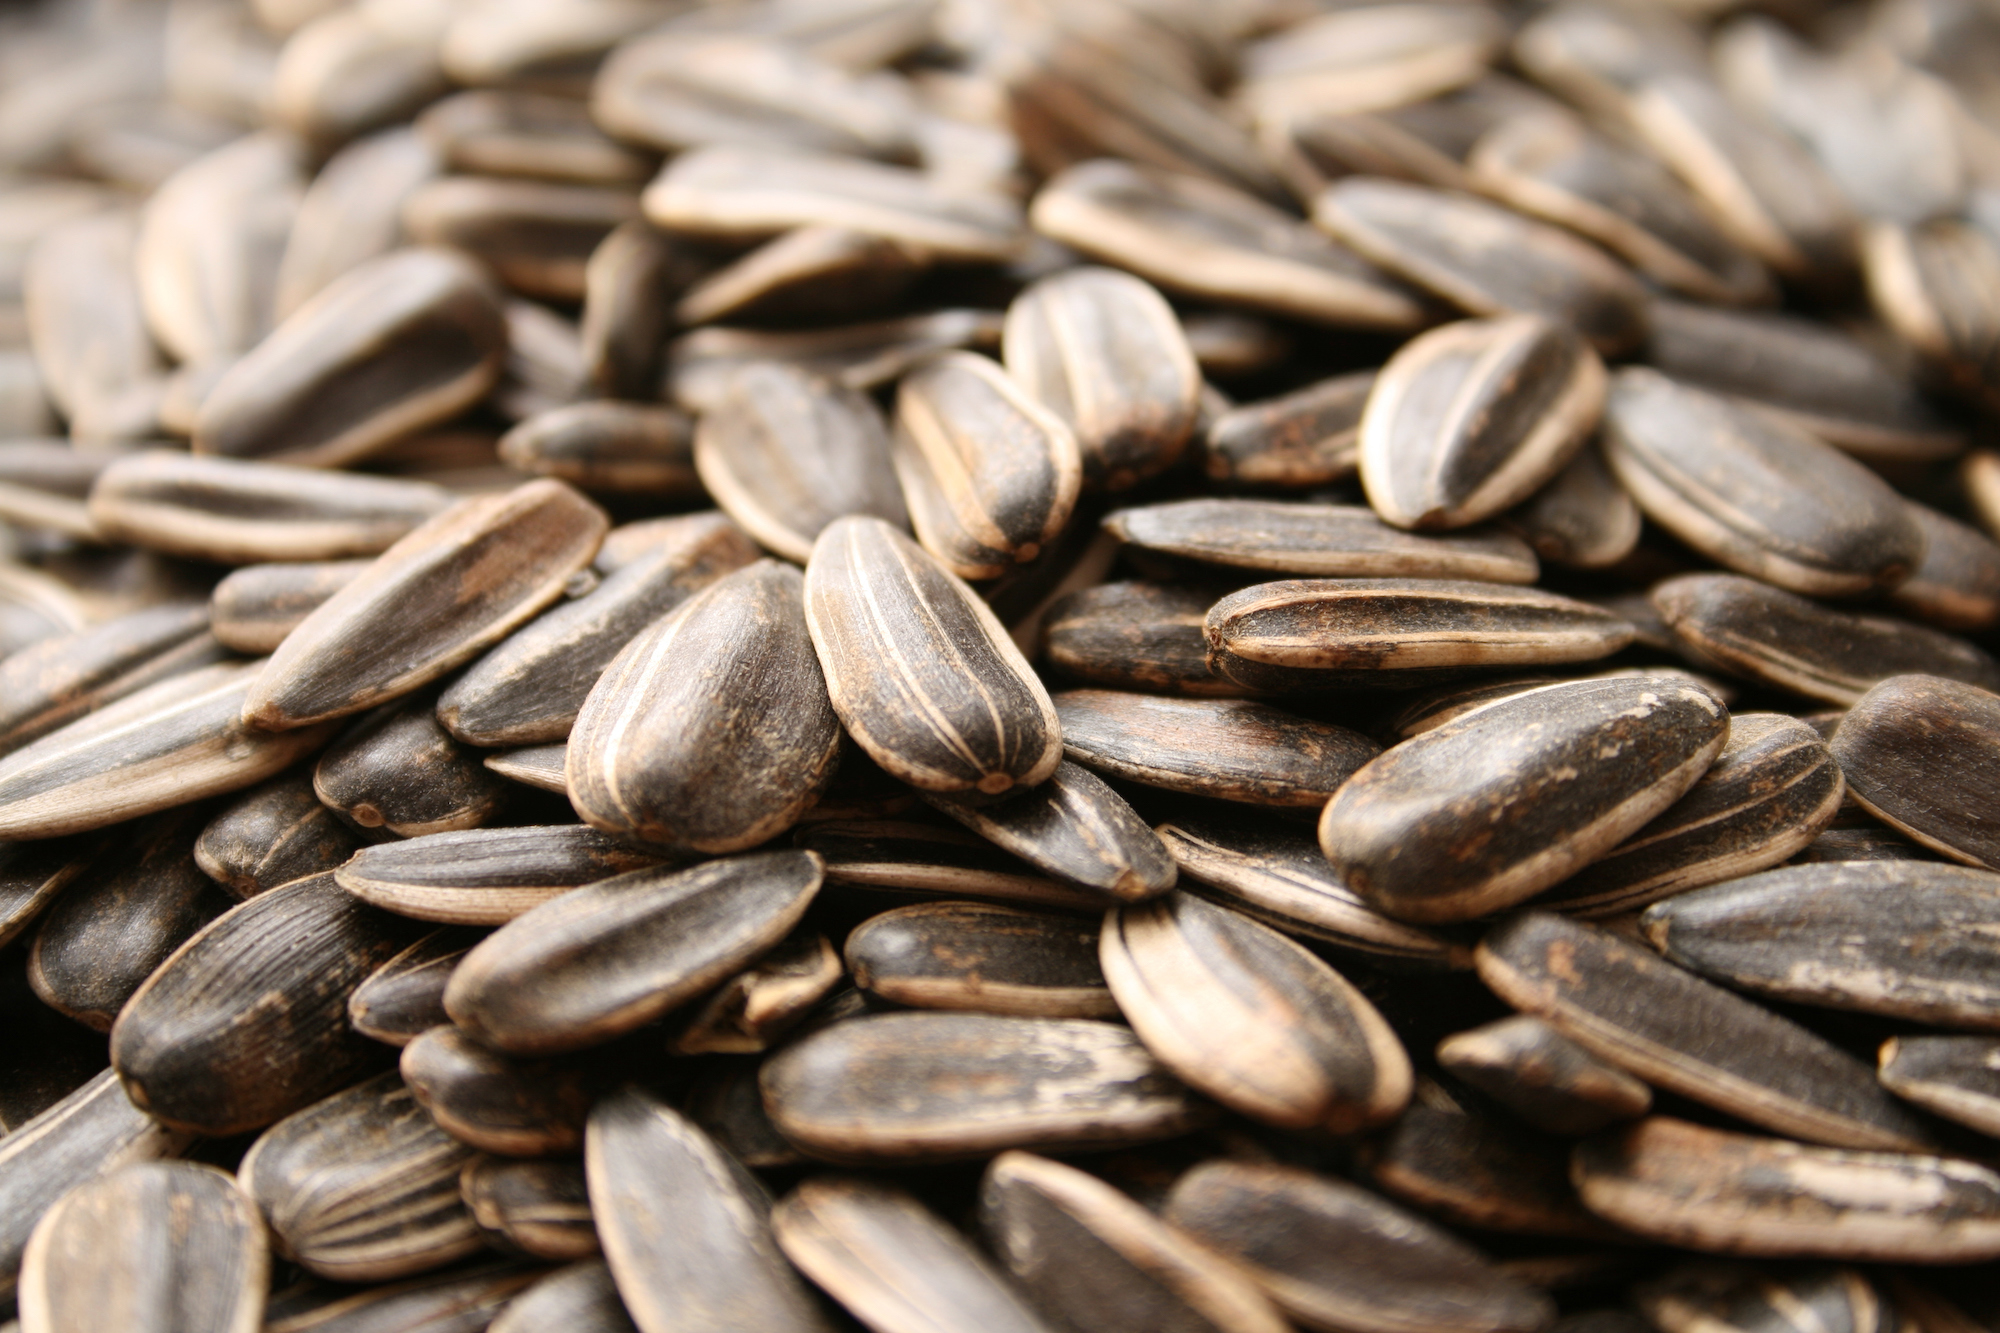 seeds and grain_sunflower seeds_iStock-157292820.jpg